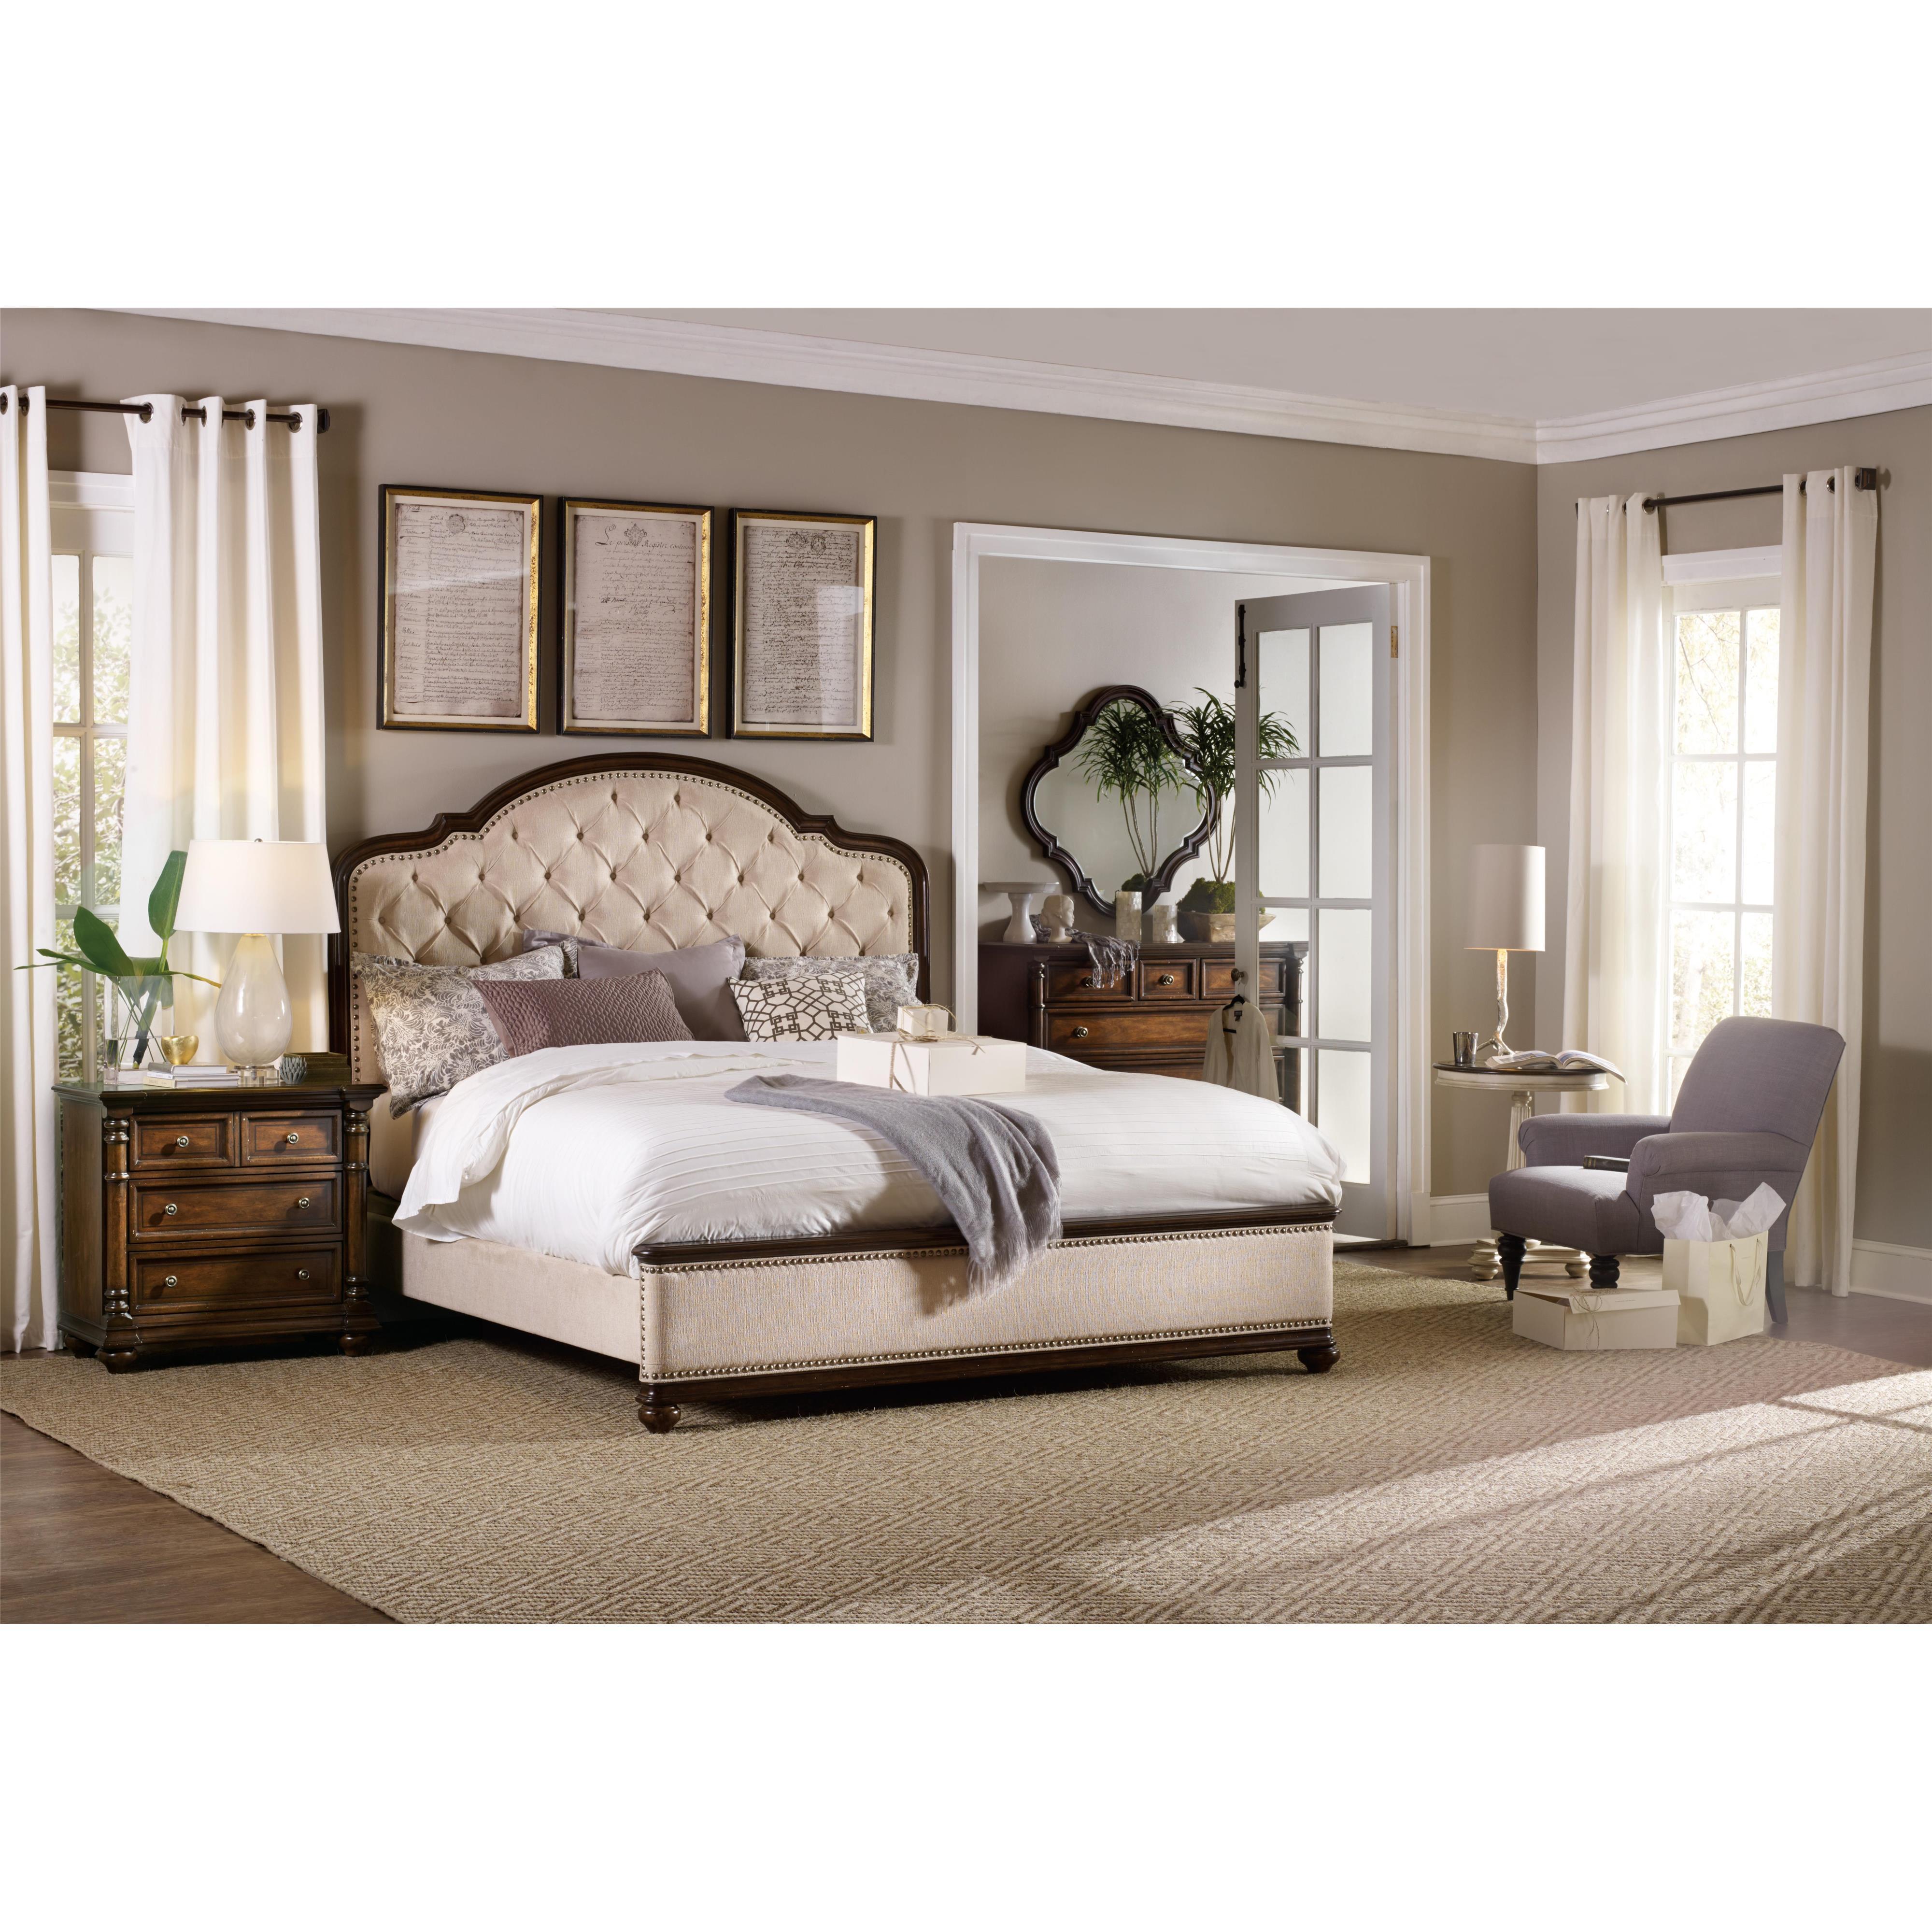 Leesburg Queen Bedroom Group by Hooker Furniture at Baer's Furniture